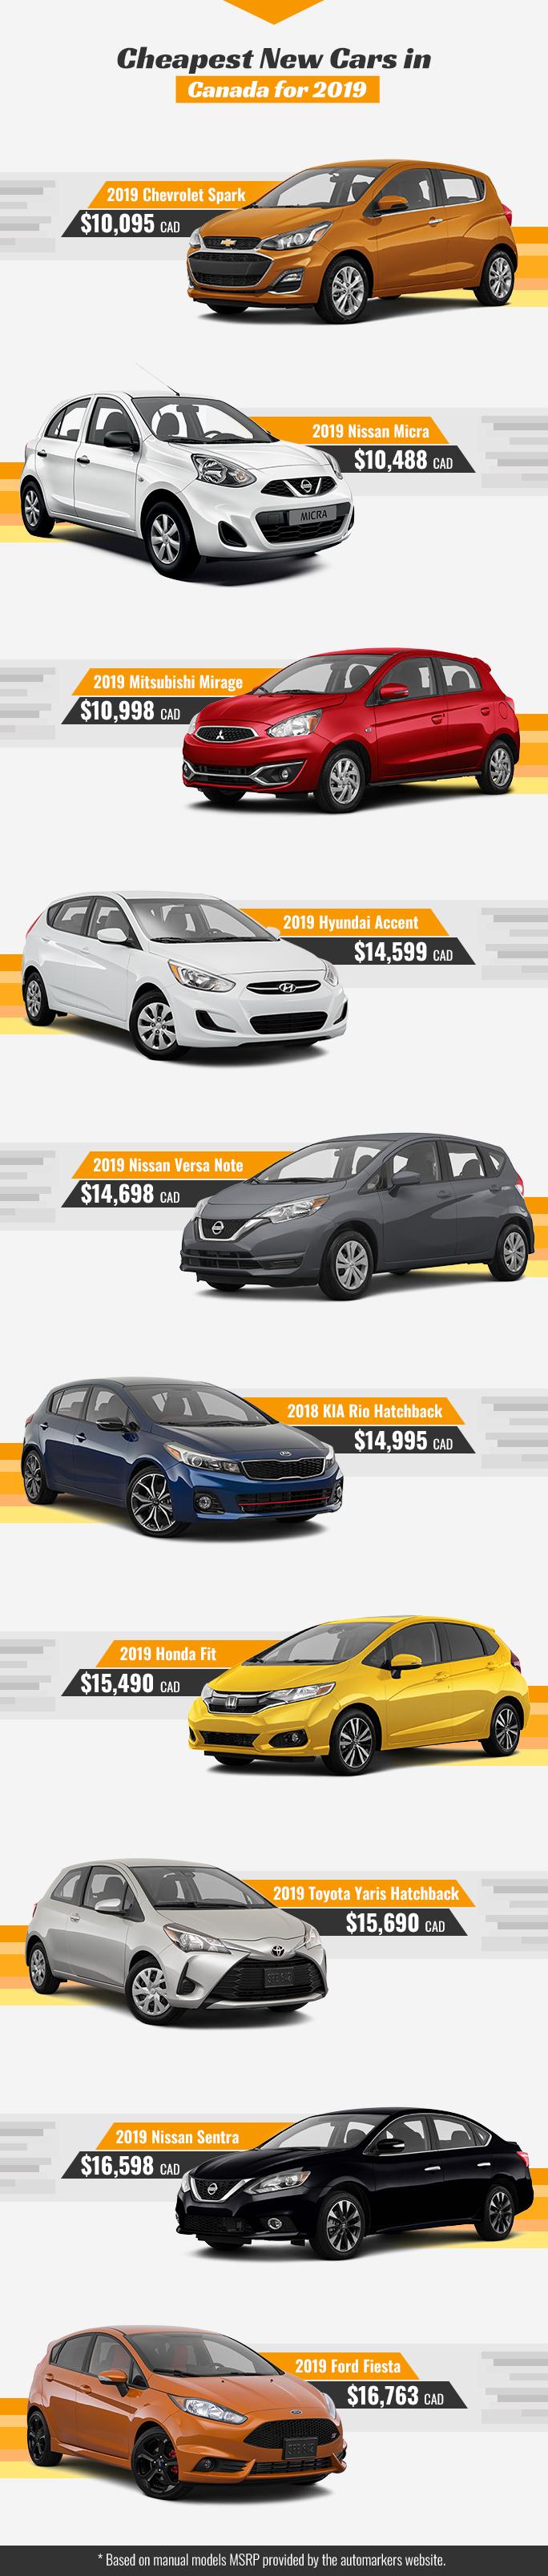 Cheapest Cars in Canada for 2019 Chevrolet Spark Nissan Micra Mitsubishi Mirage Hyundai Accent Nissan Versa Note Kia Rio Honda Fit Toyota Yaris Nissan Sentra Ford Fiesta